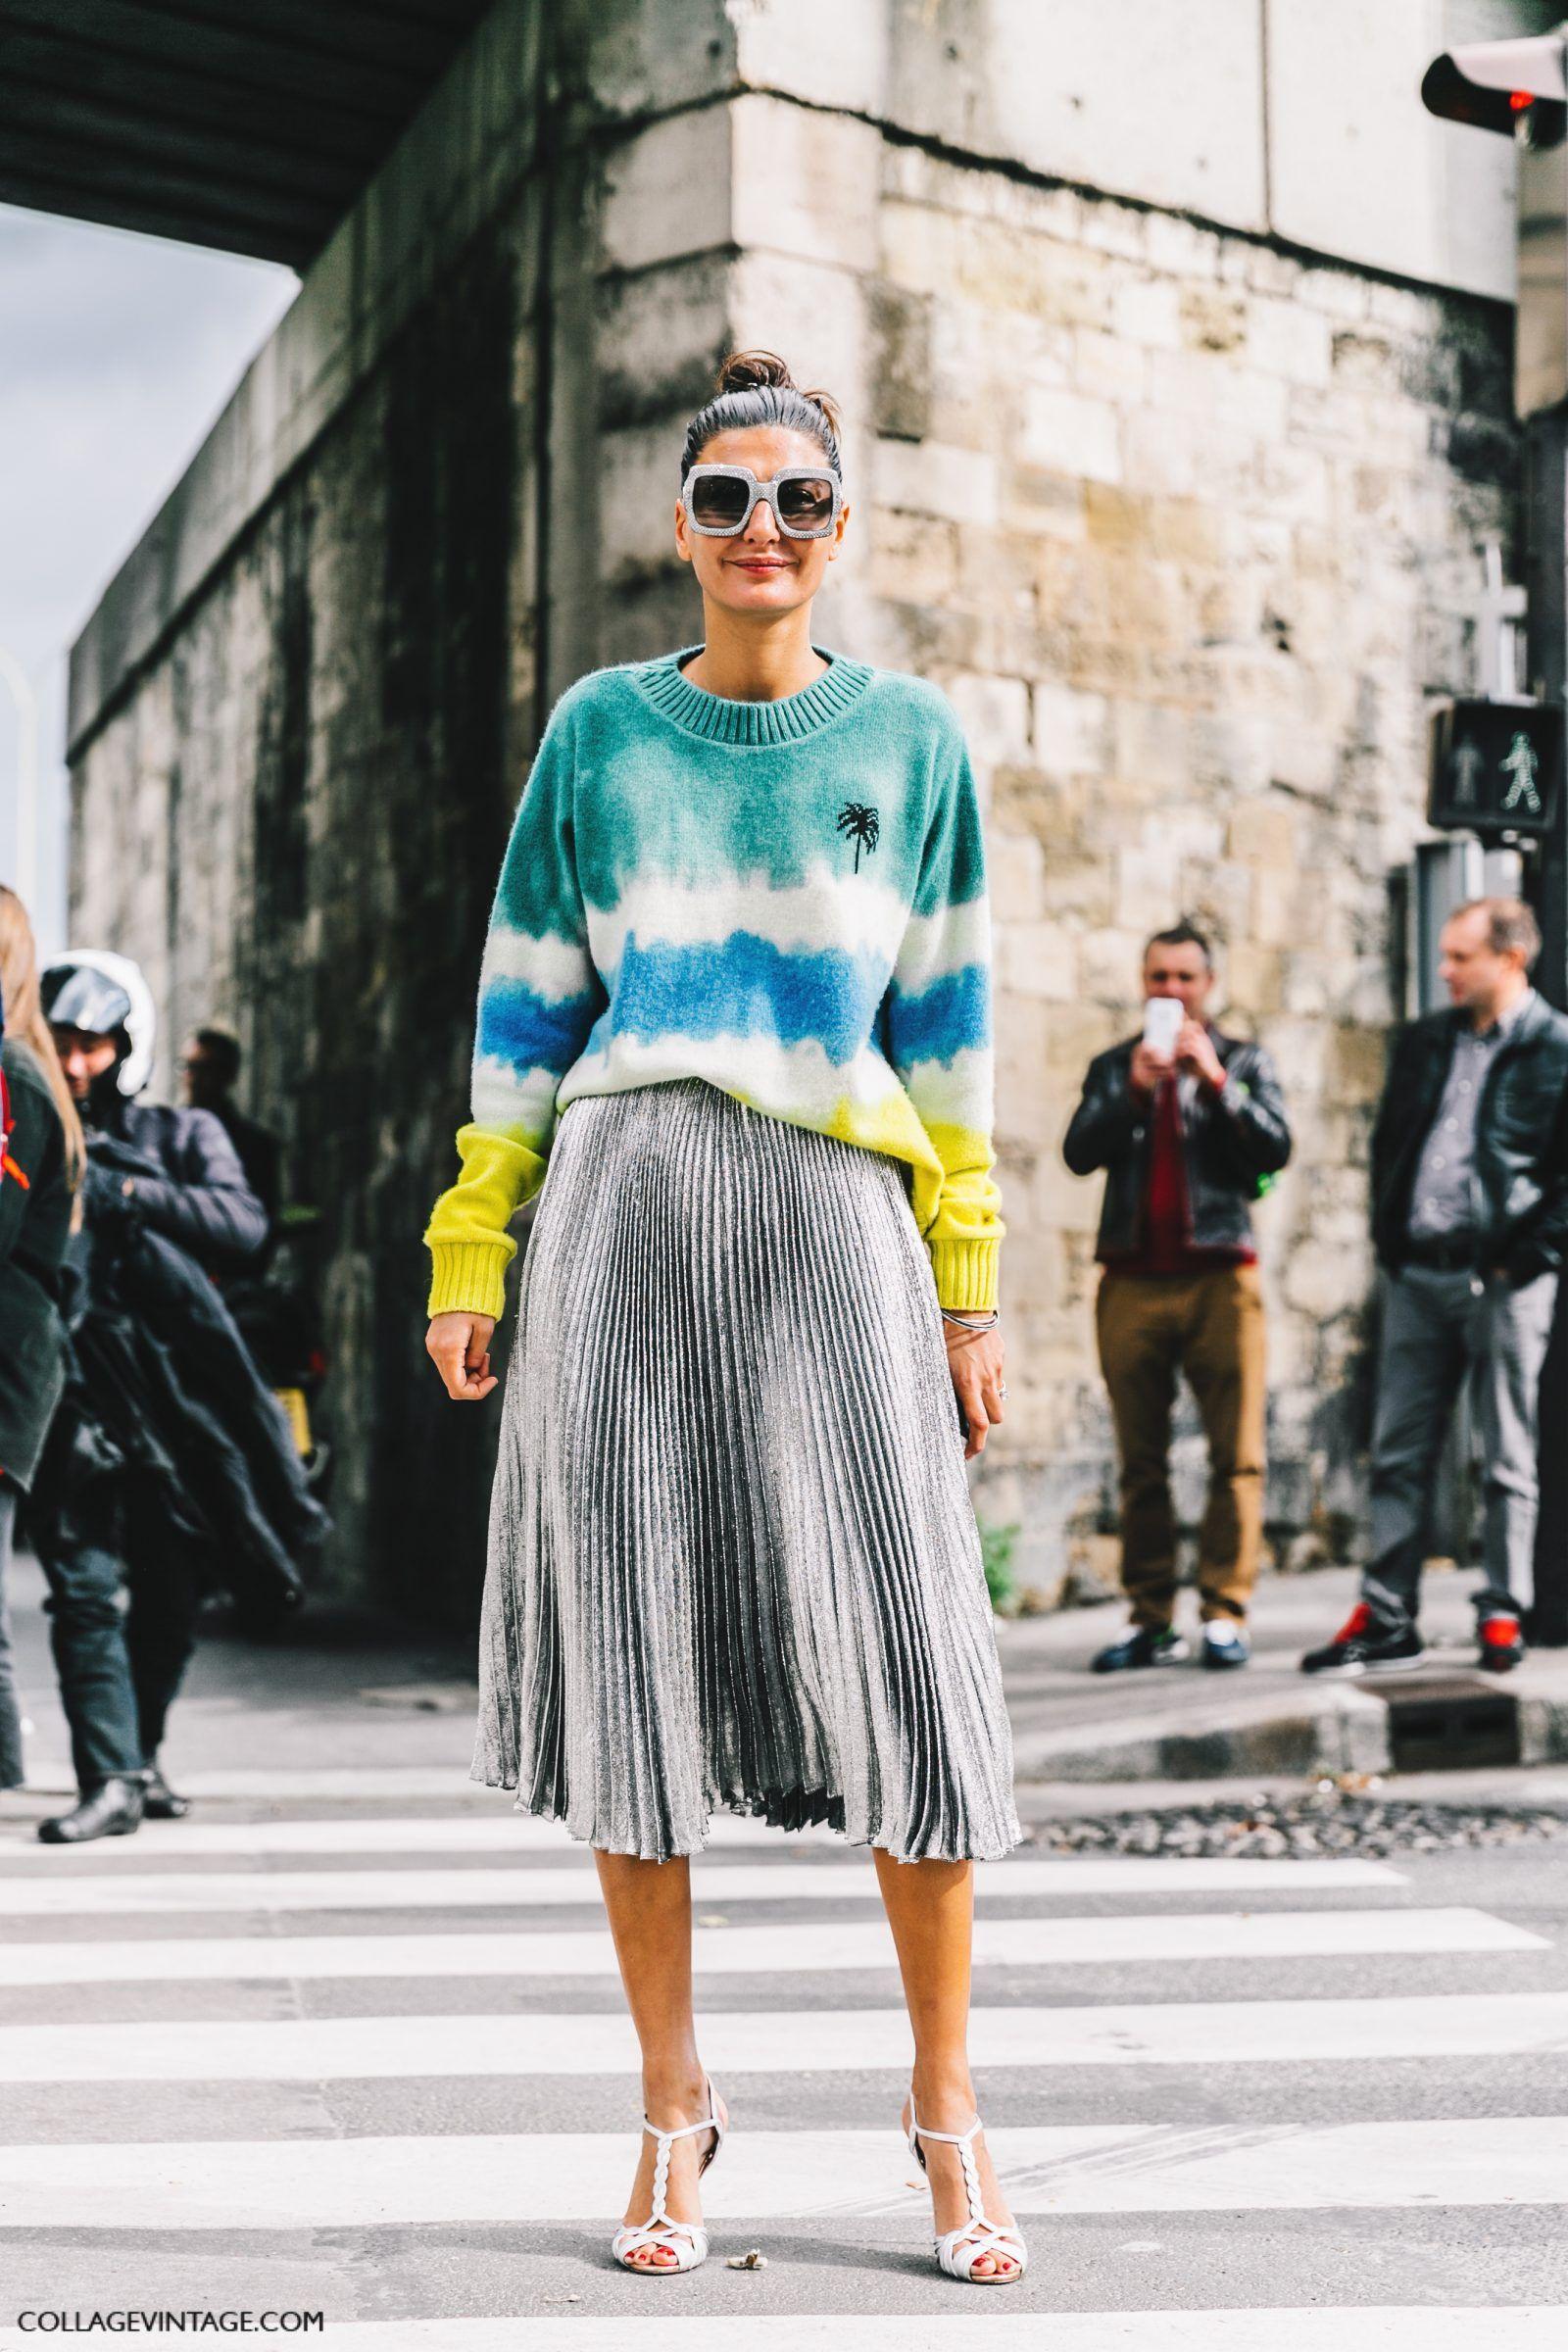 pfw-paris_fashion_week_ss17-street_style-outfits-collage_vintage-valentino-balenciaga-celine-38